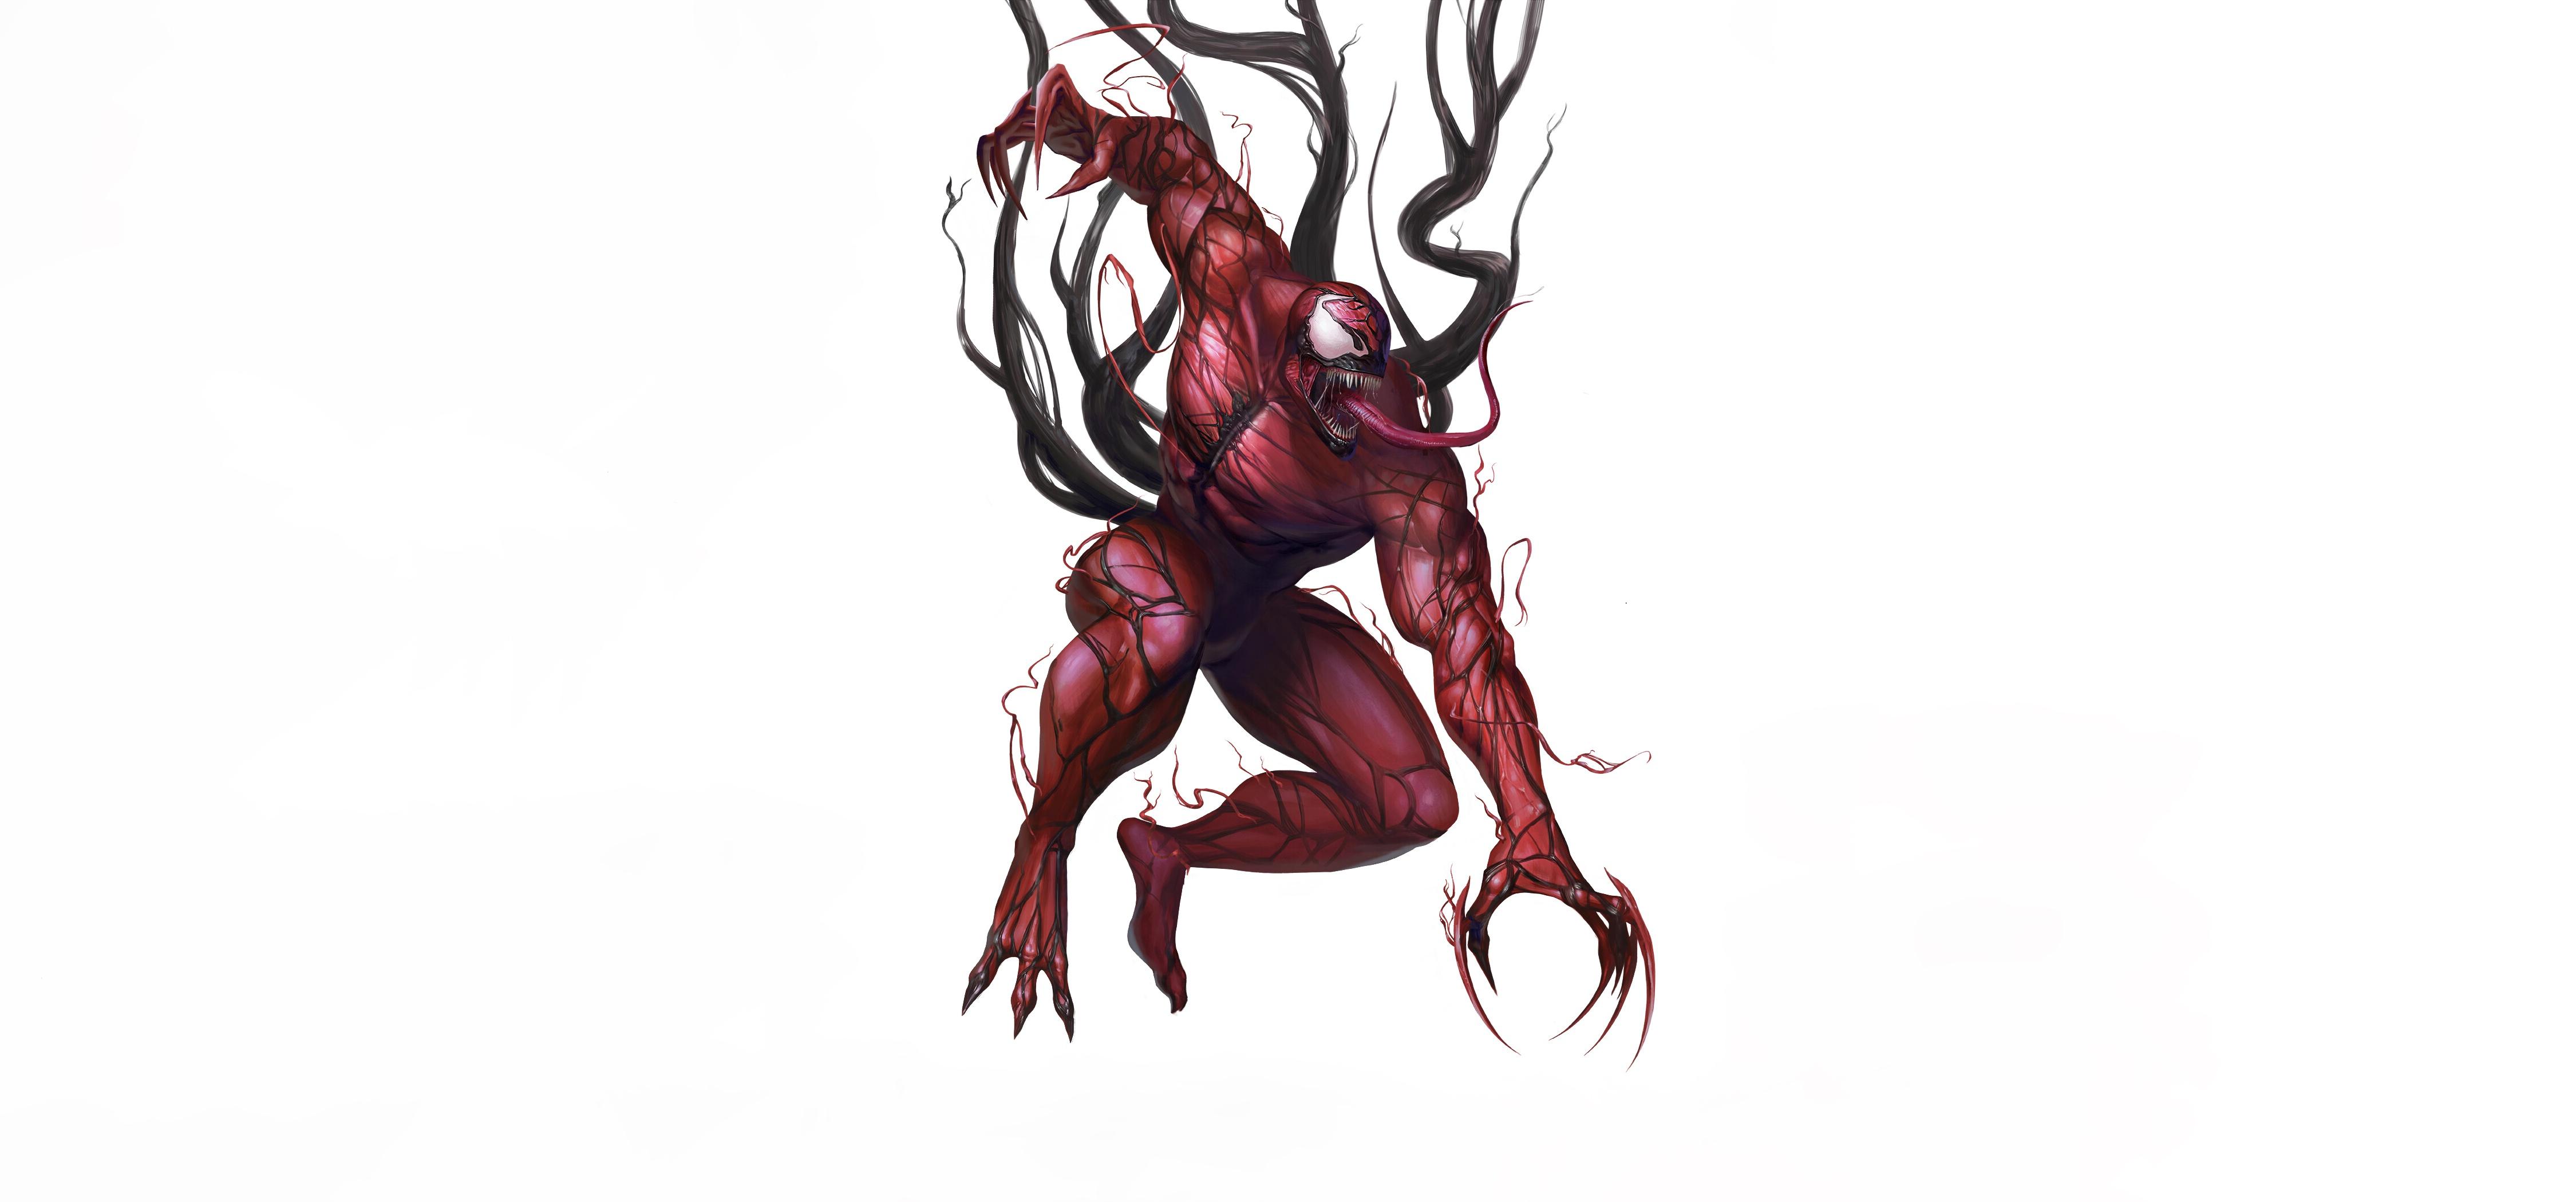 artwork carnage creature simple background venom